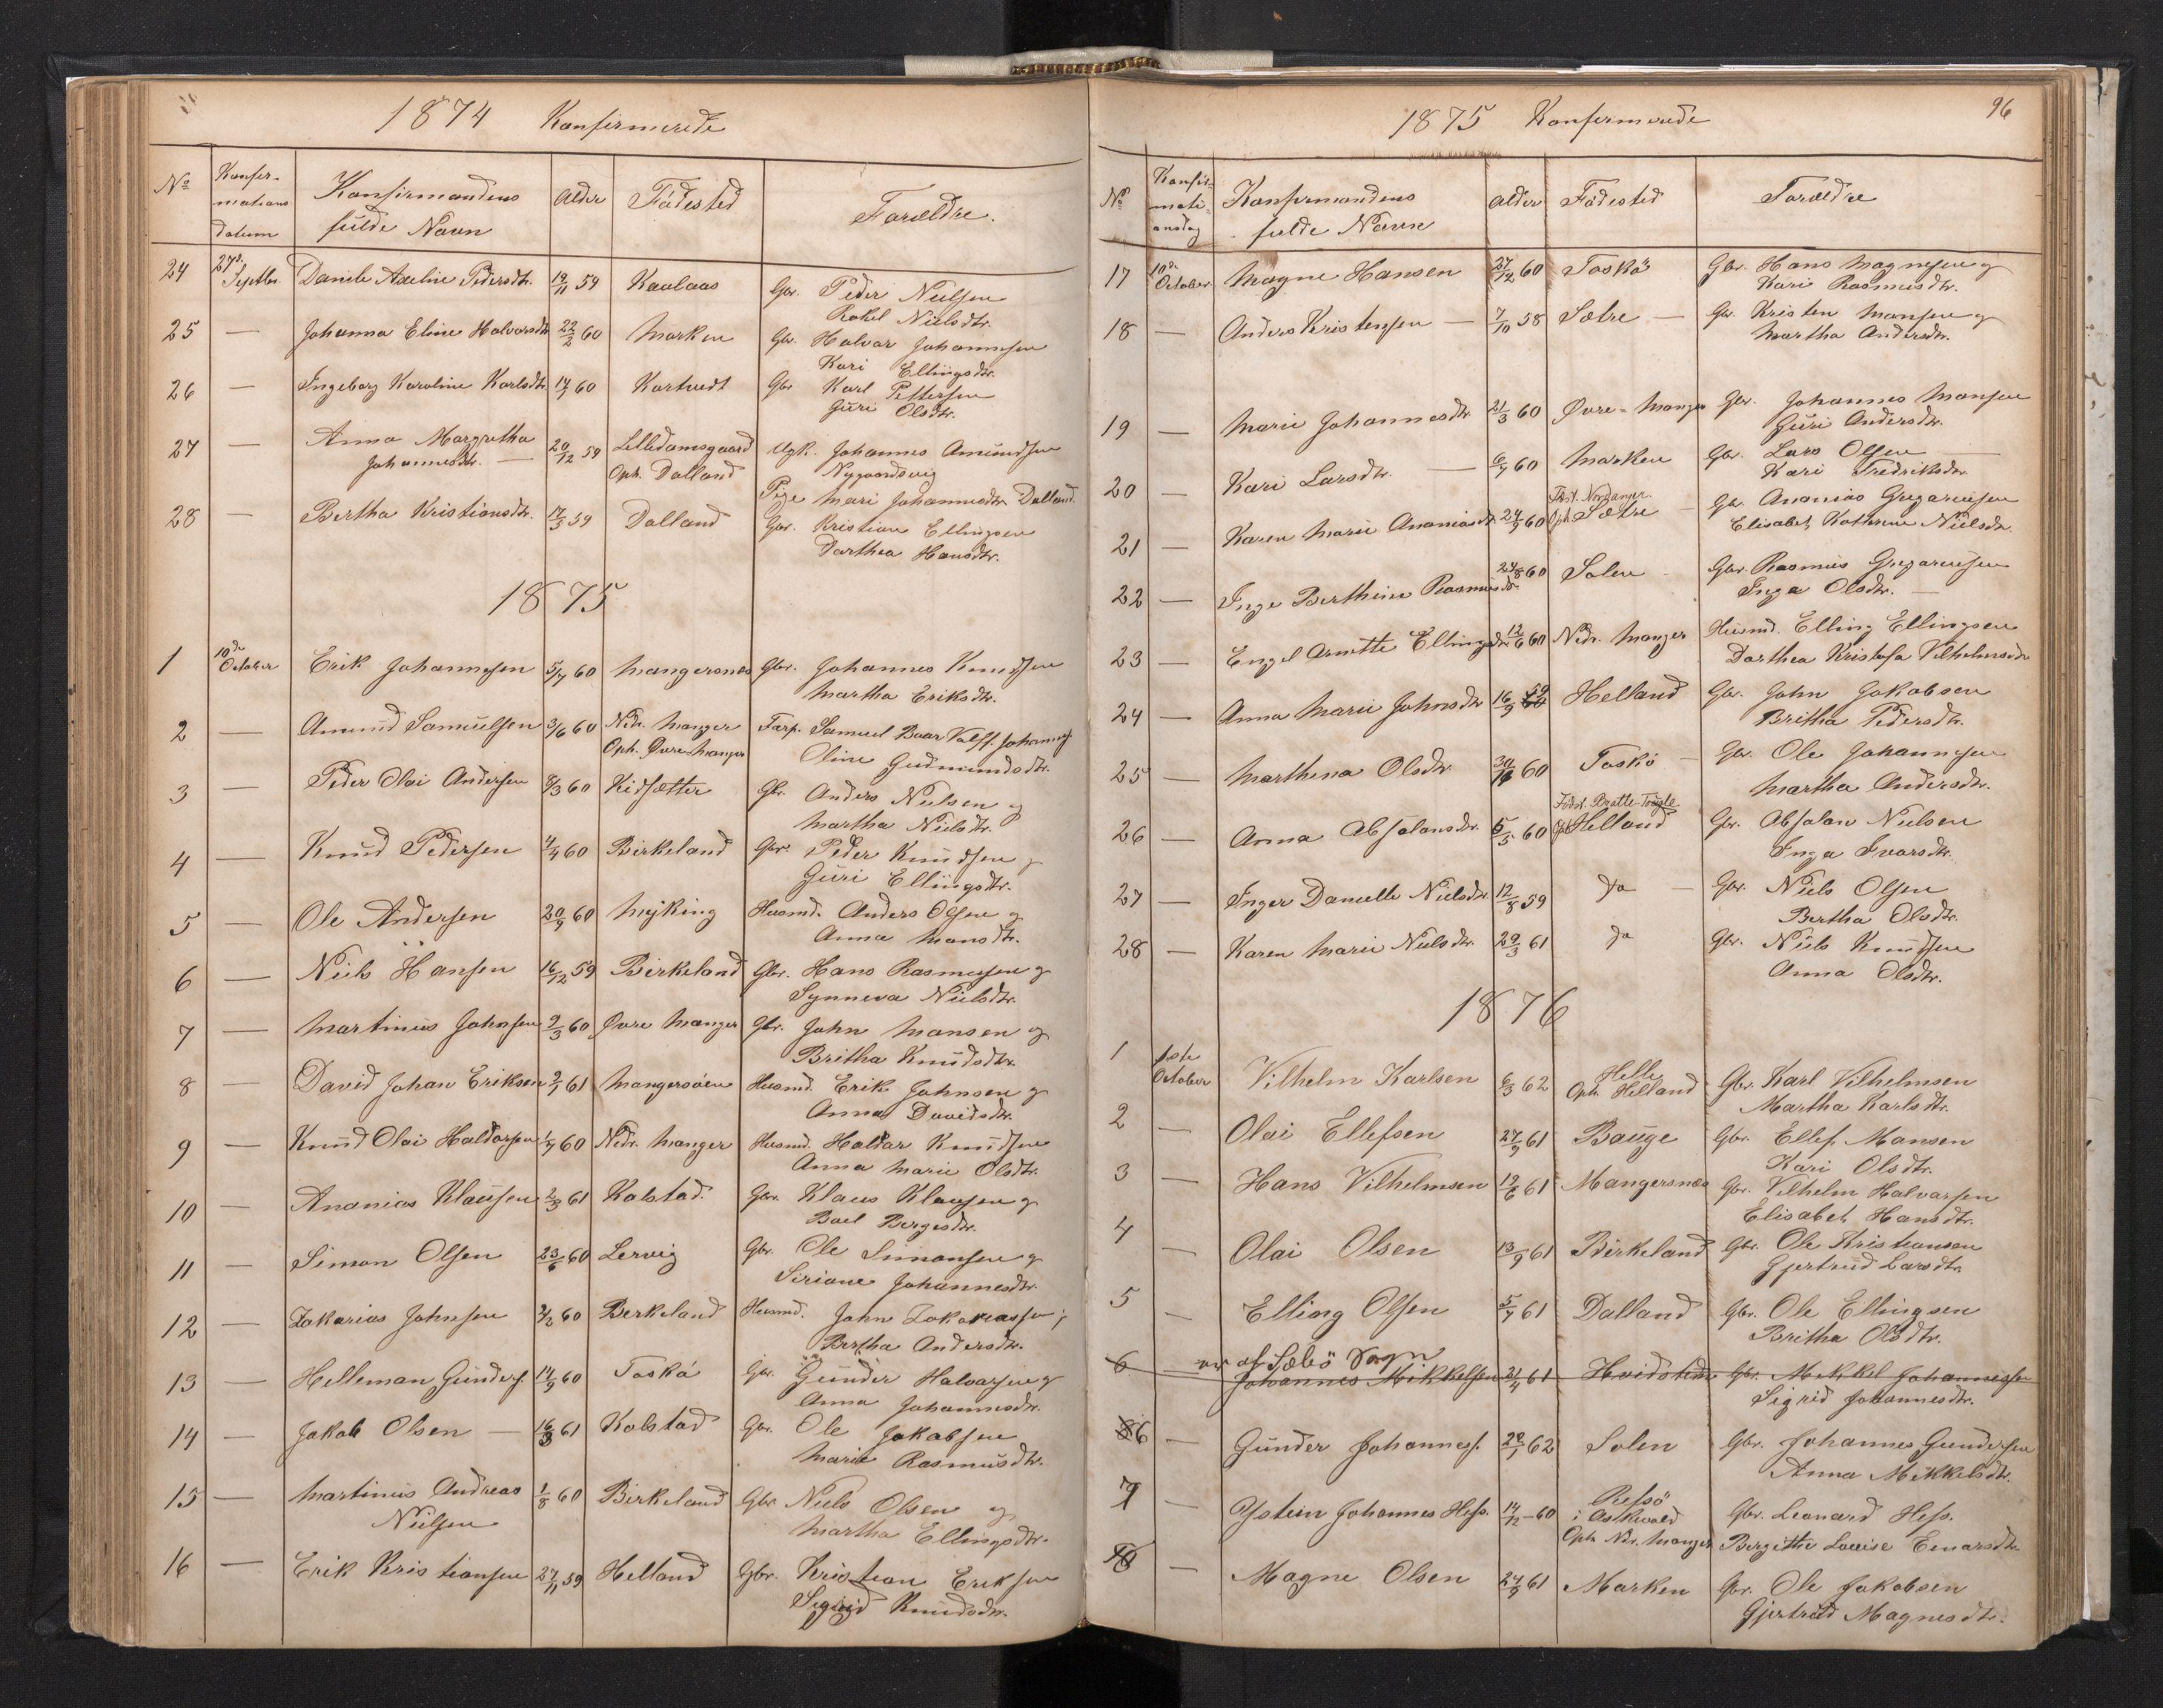 SAB, Manger sokneprestembete, H/Hab: Parish register (copy) no. A 1, 1874-1901, p. 95b-96a